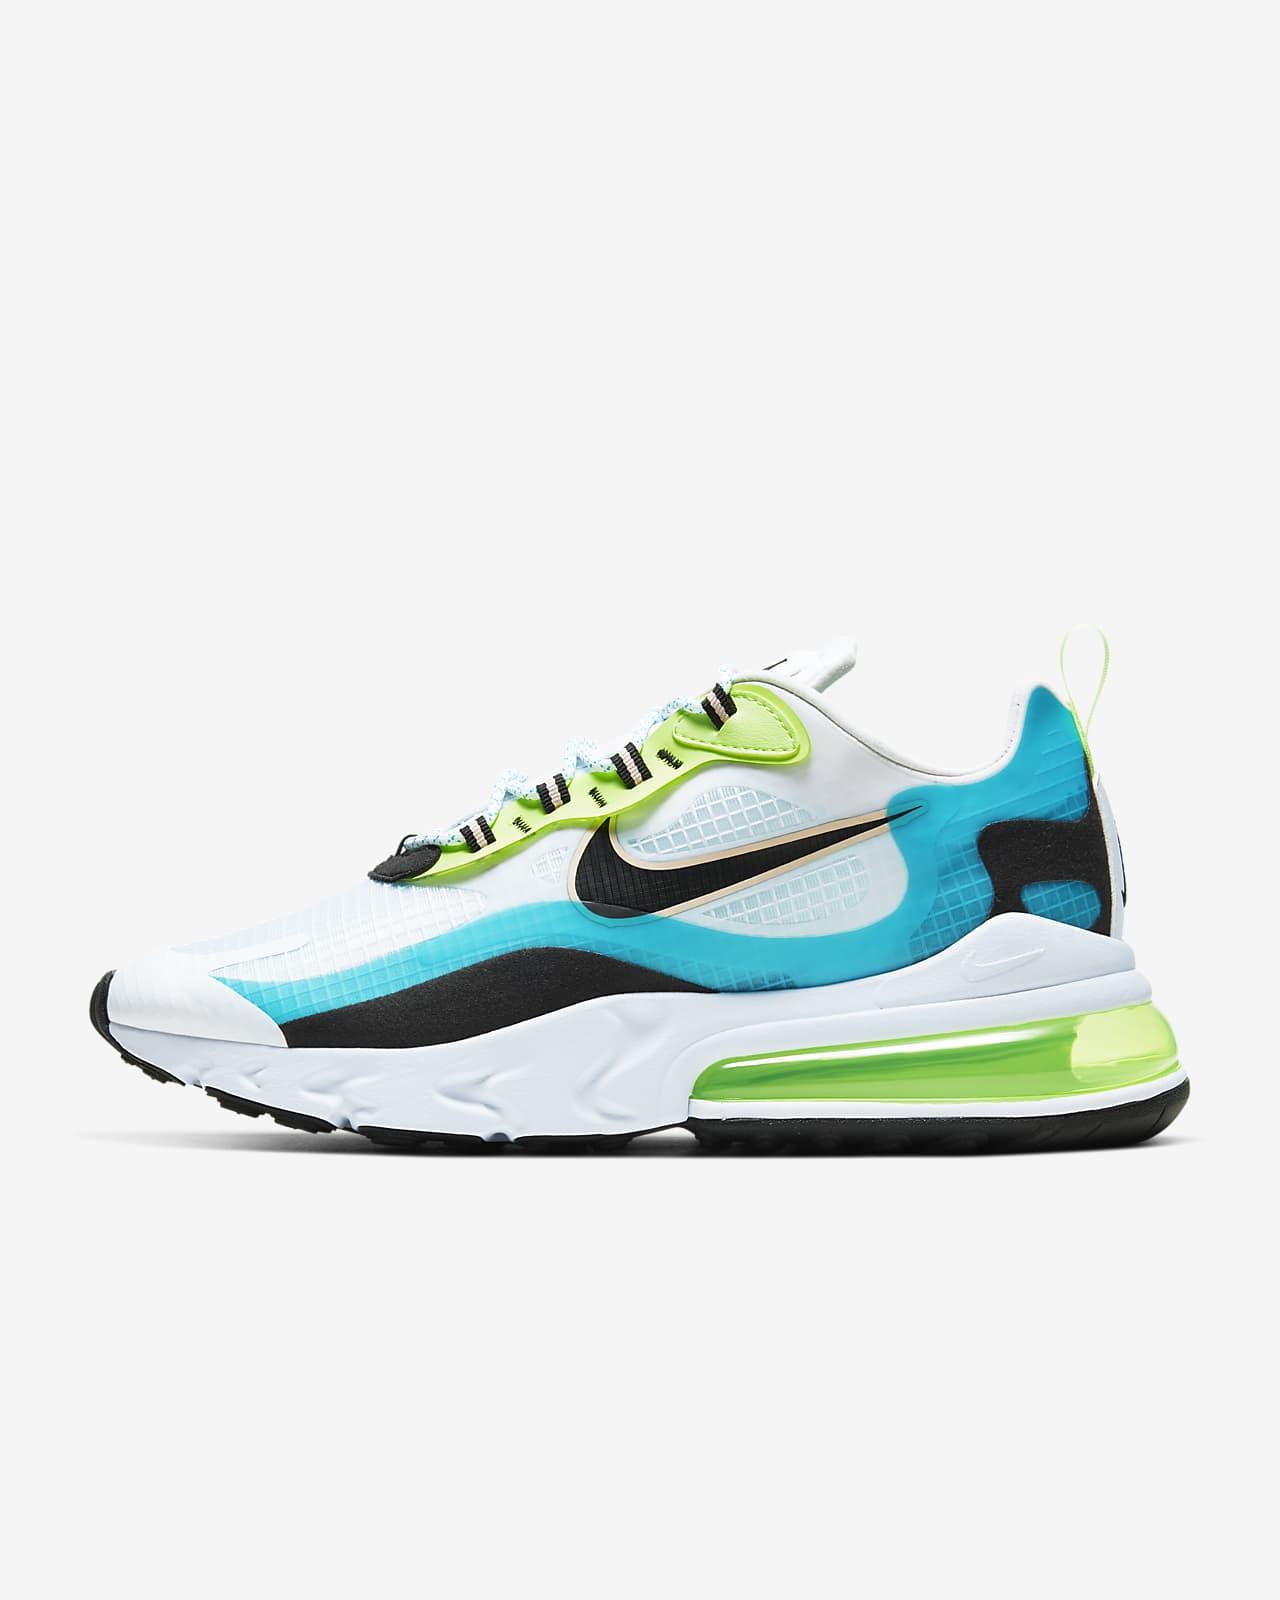 Nike Air Max 270 React SE Herenschoen